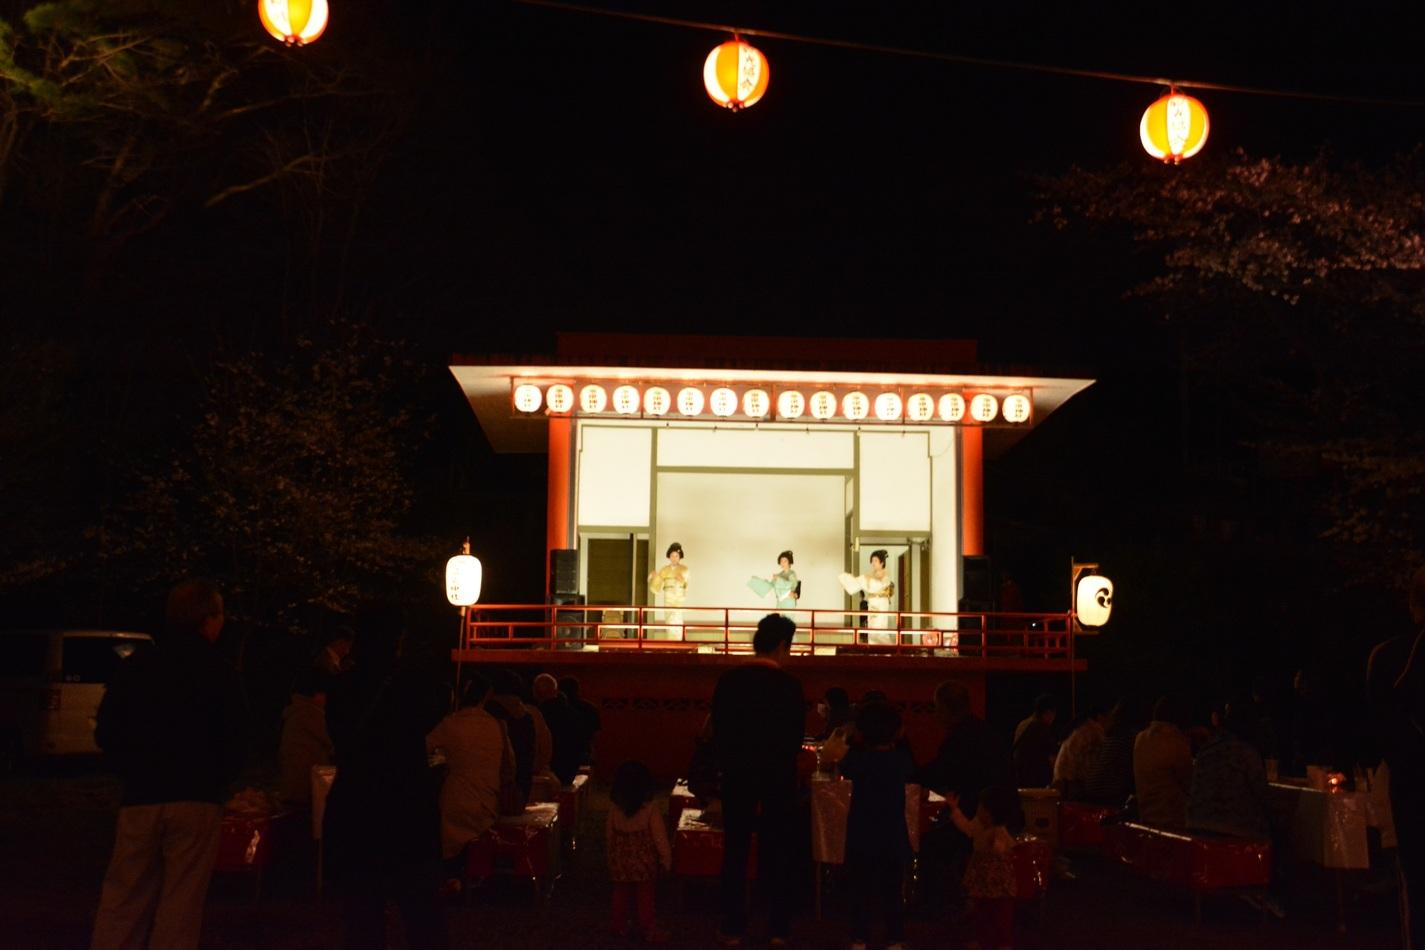 Night Cherry Blossom Festival in Kinugawa-onsen